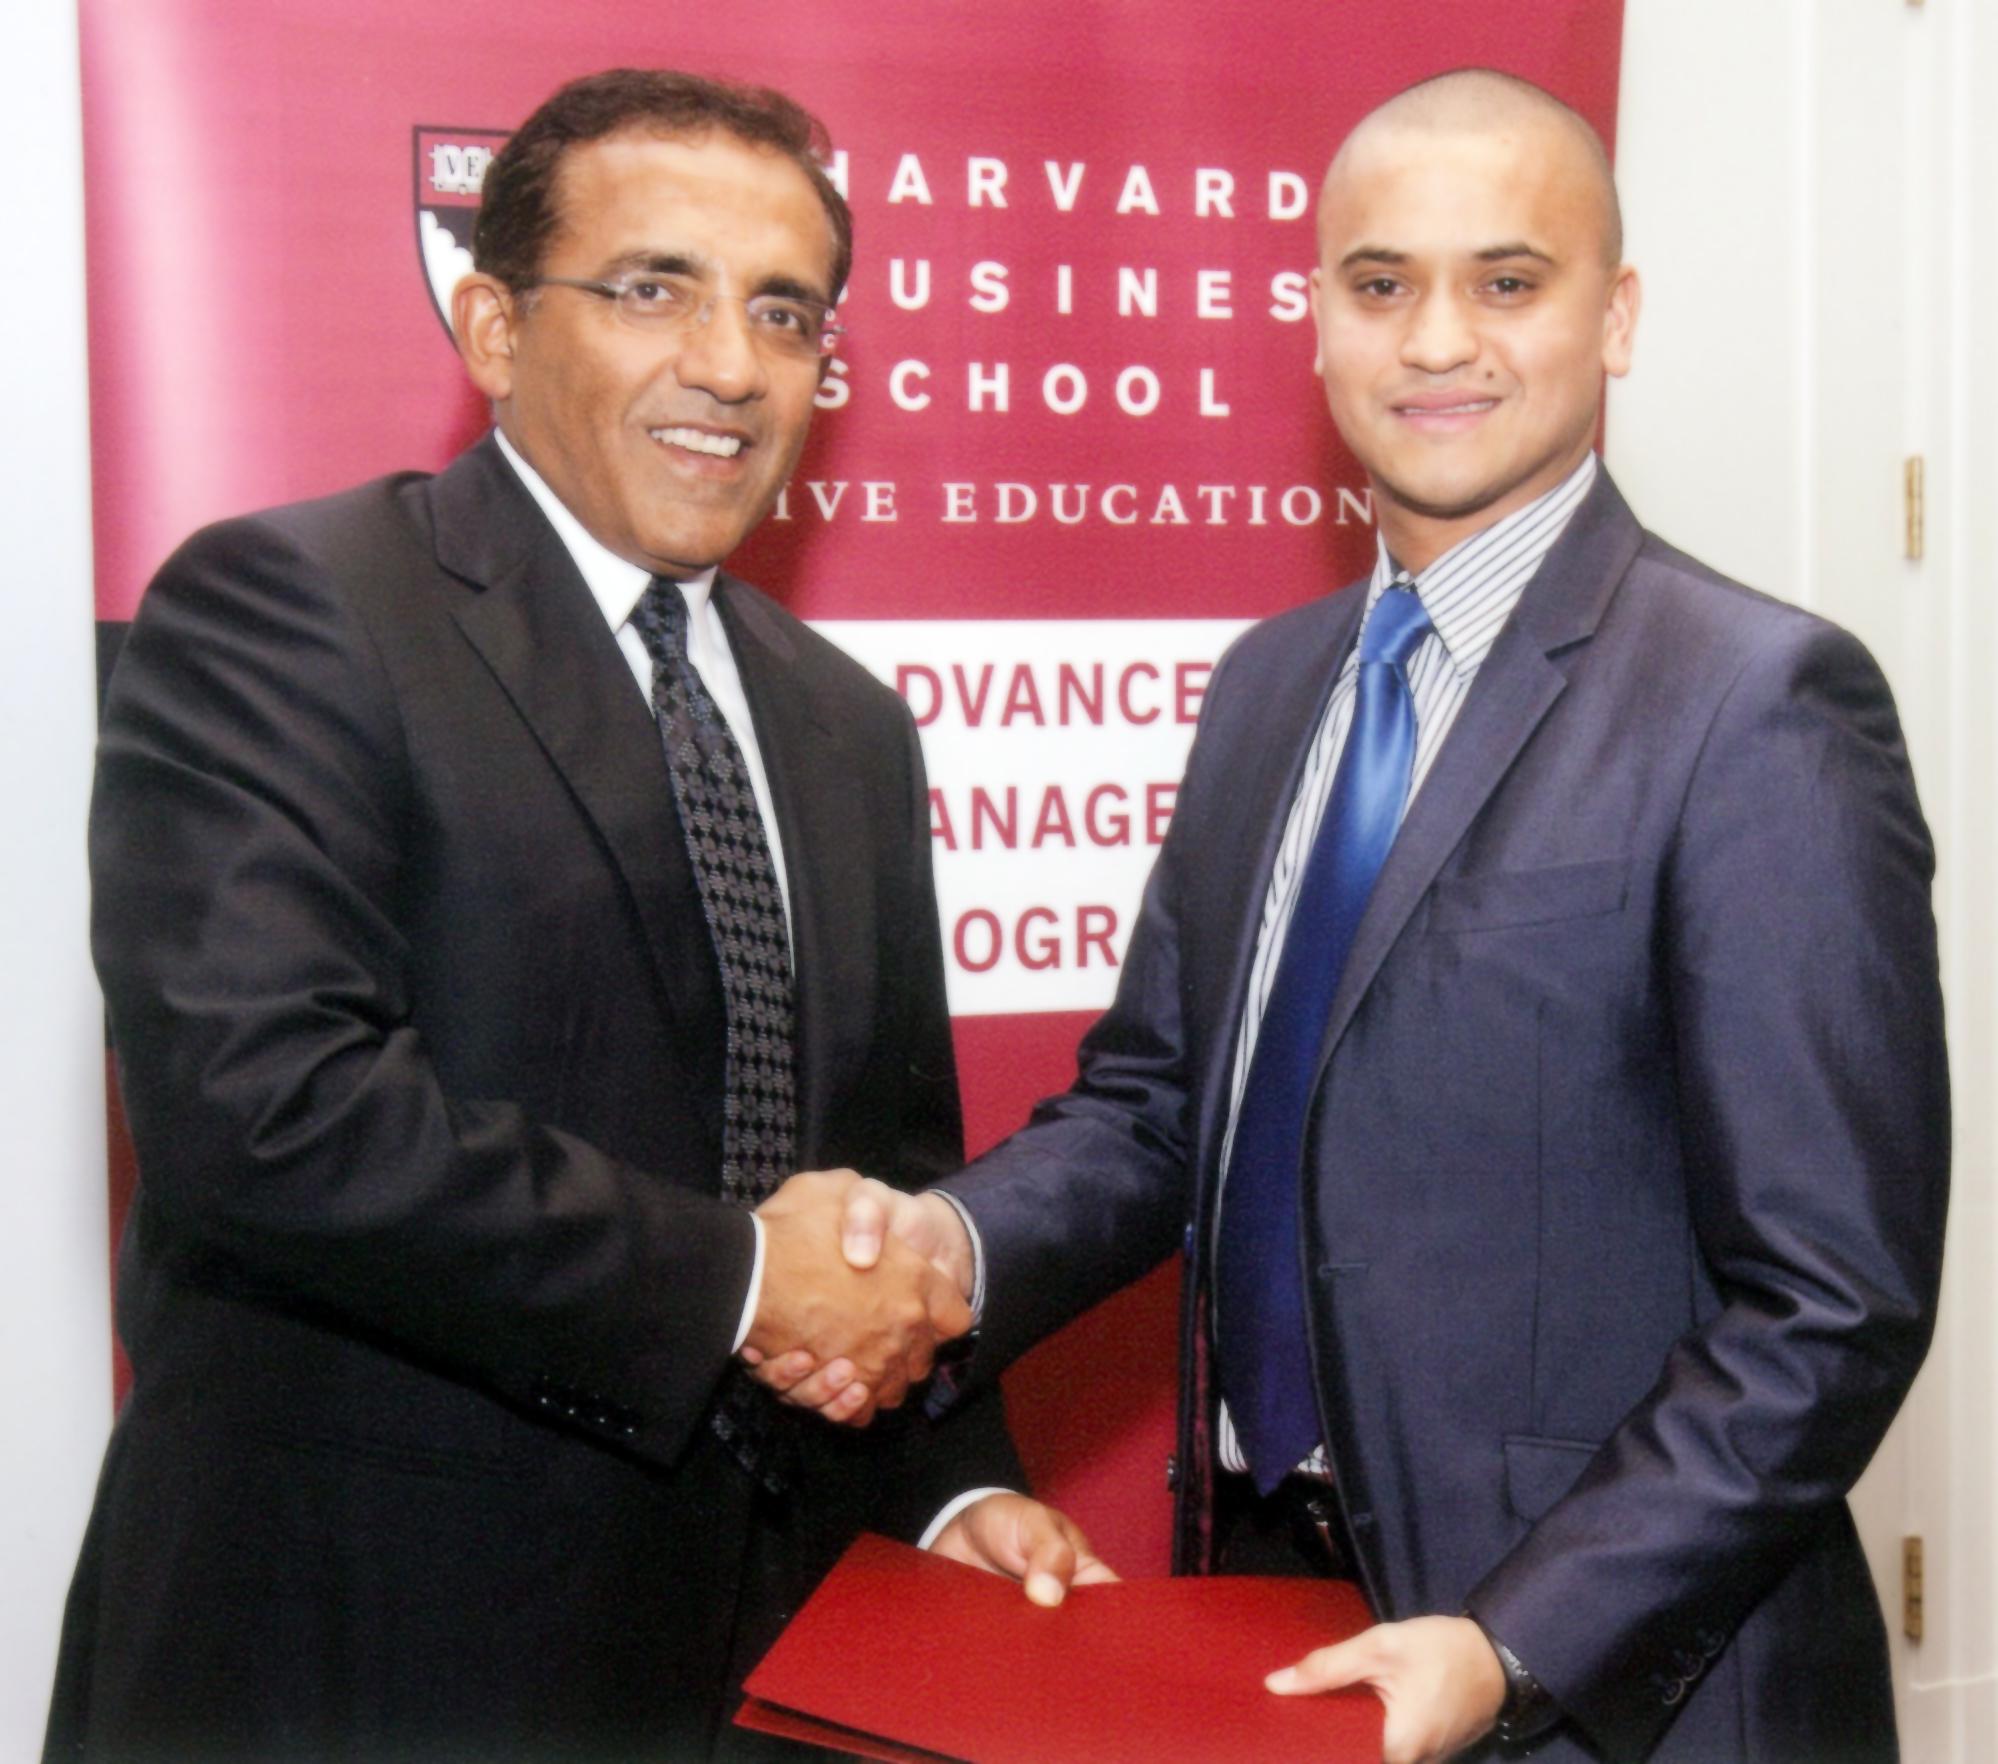 2017/18 Harvard South Africa Fellowship Program (Funding Available)